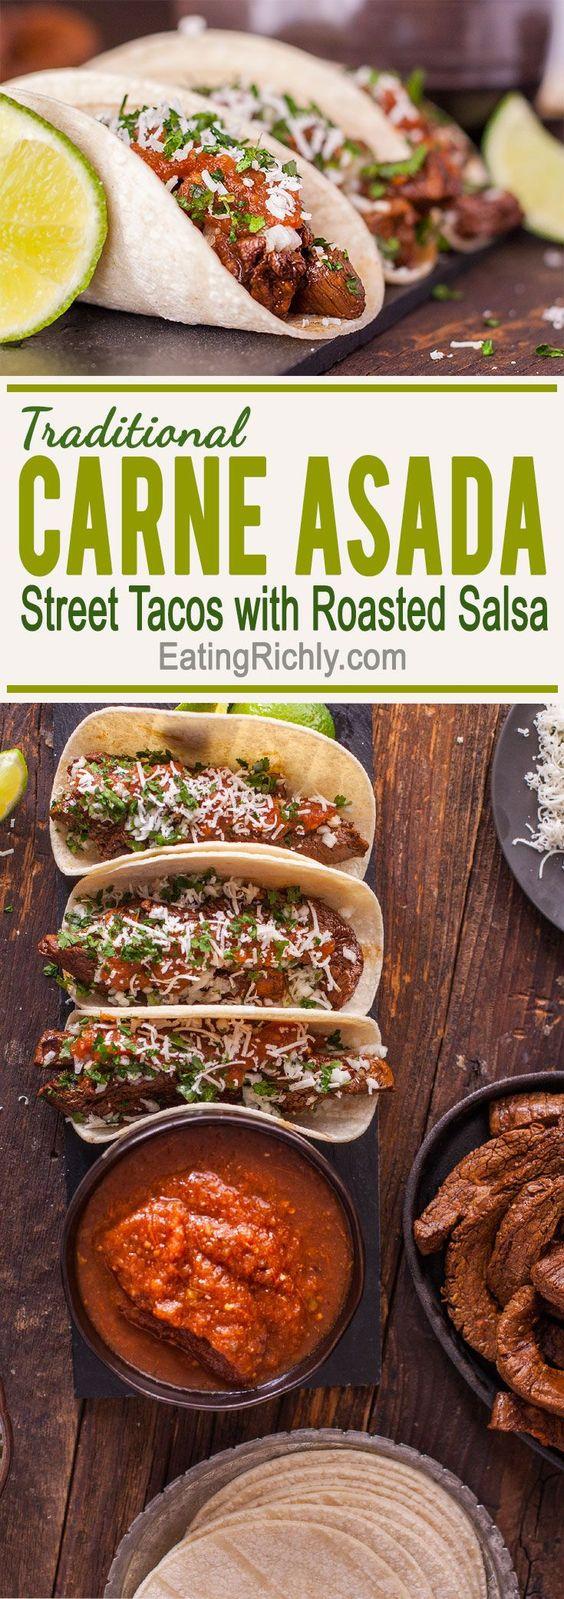 Carne Asada Traditional Taco Recipe